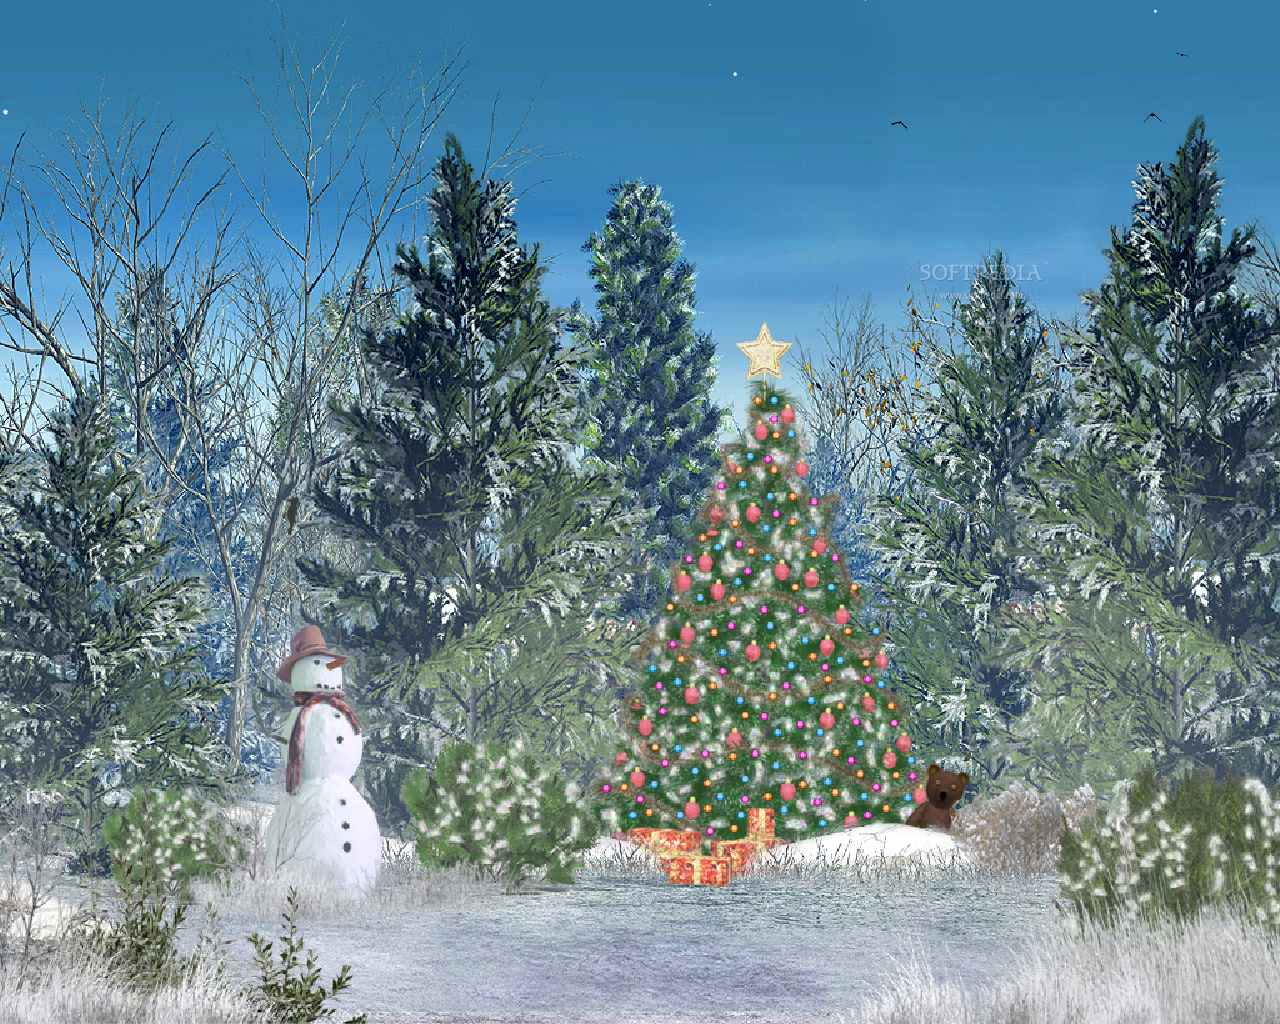 47] Animated Christmas Desktop Wallpaper on WallpaperSafari 1280x1024